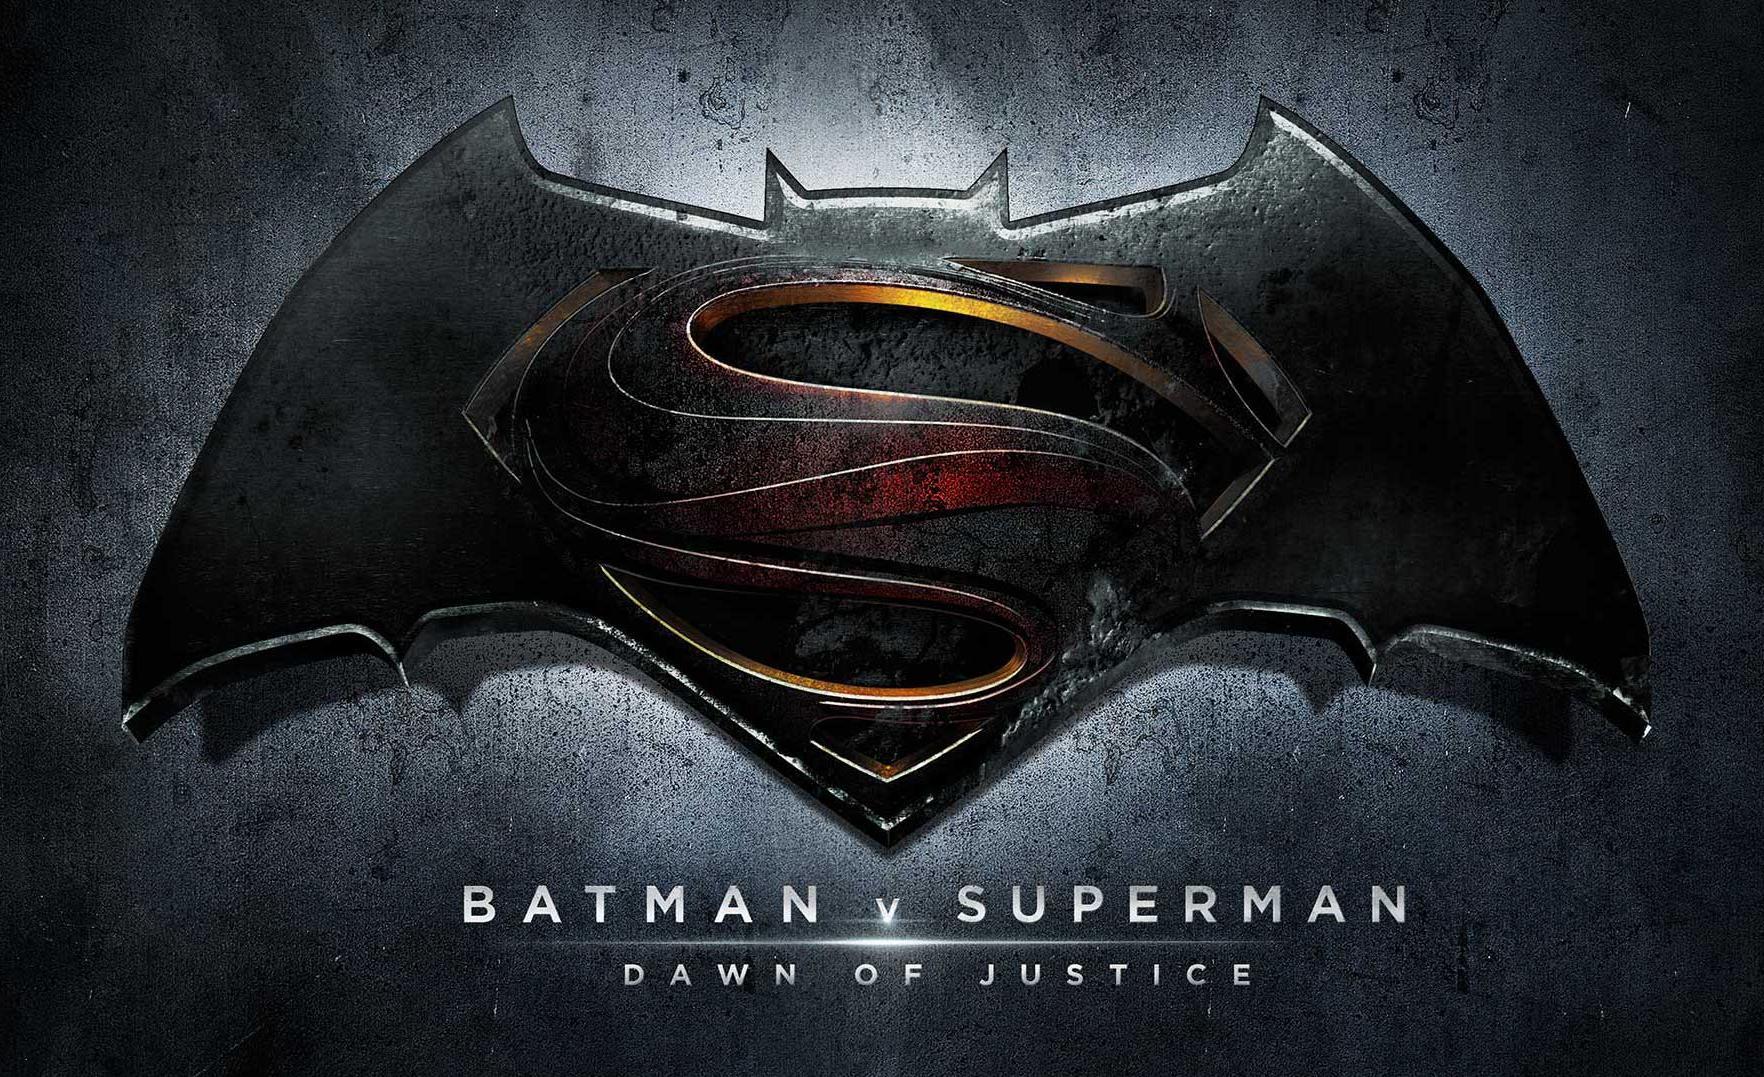 Perché Batman v Superman fa male ai cinecomics